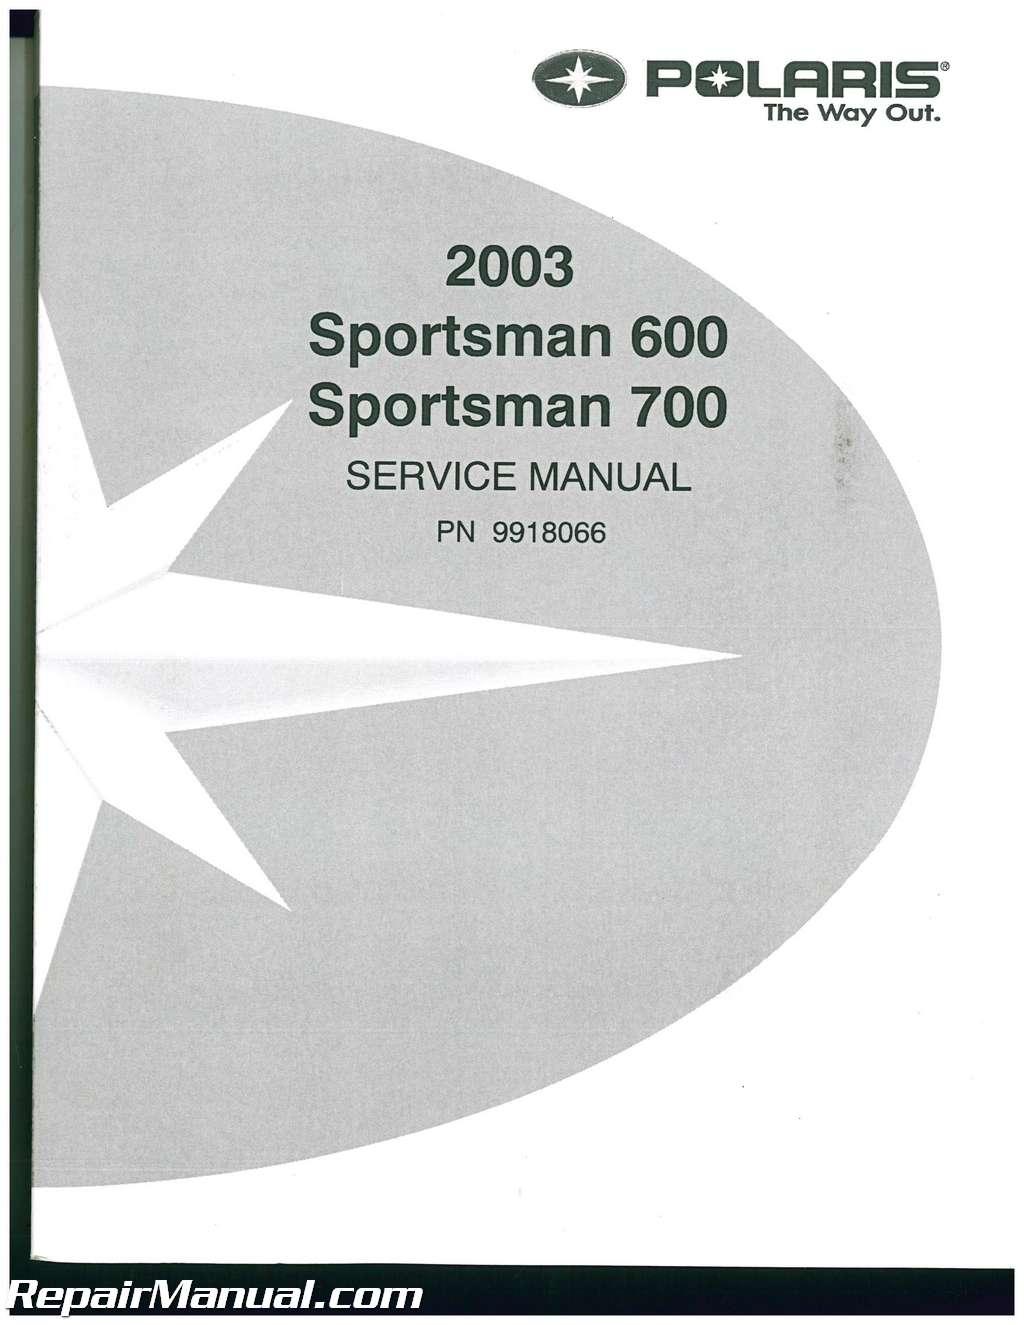 2002 2003 polaris sportsman 600 700 twin atv service manual rh ebay com 2004 polaris sportsman 700 service manual pdf 2003 polaris sportsman 700 owners manual